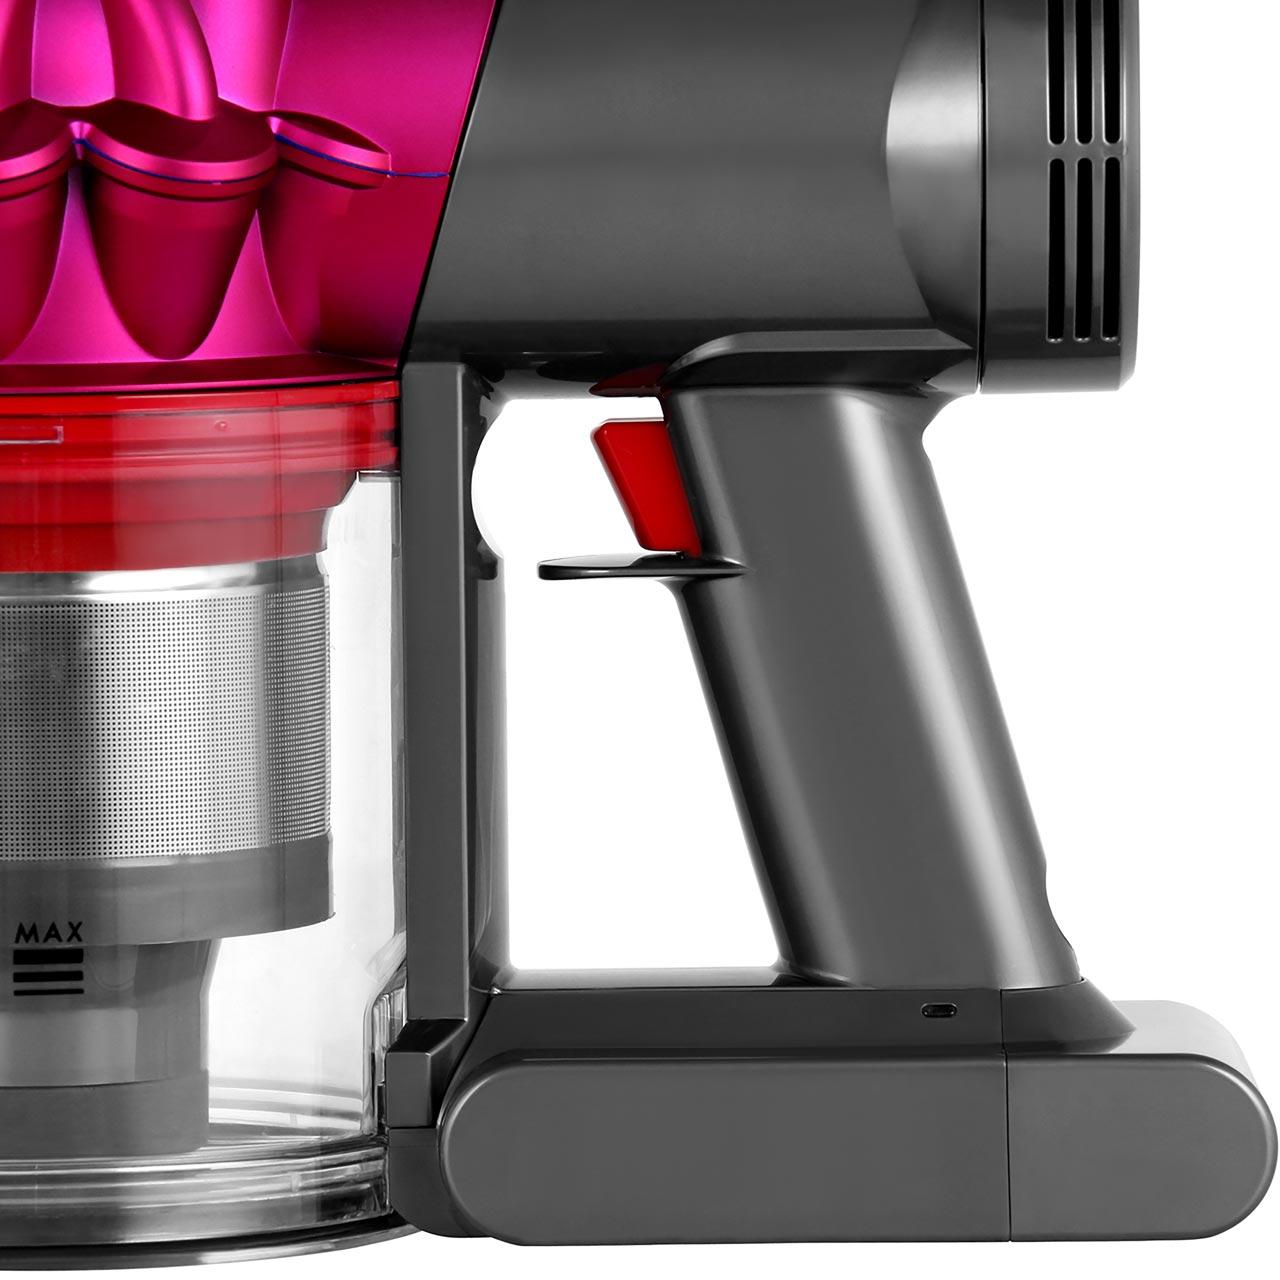 dyson v7 motorhead cordless vacuum cleaner 2 year. Black Bedroom Furniture Sets. Home Design Ideas